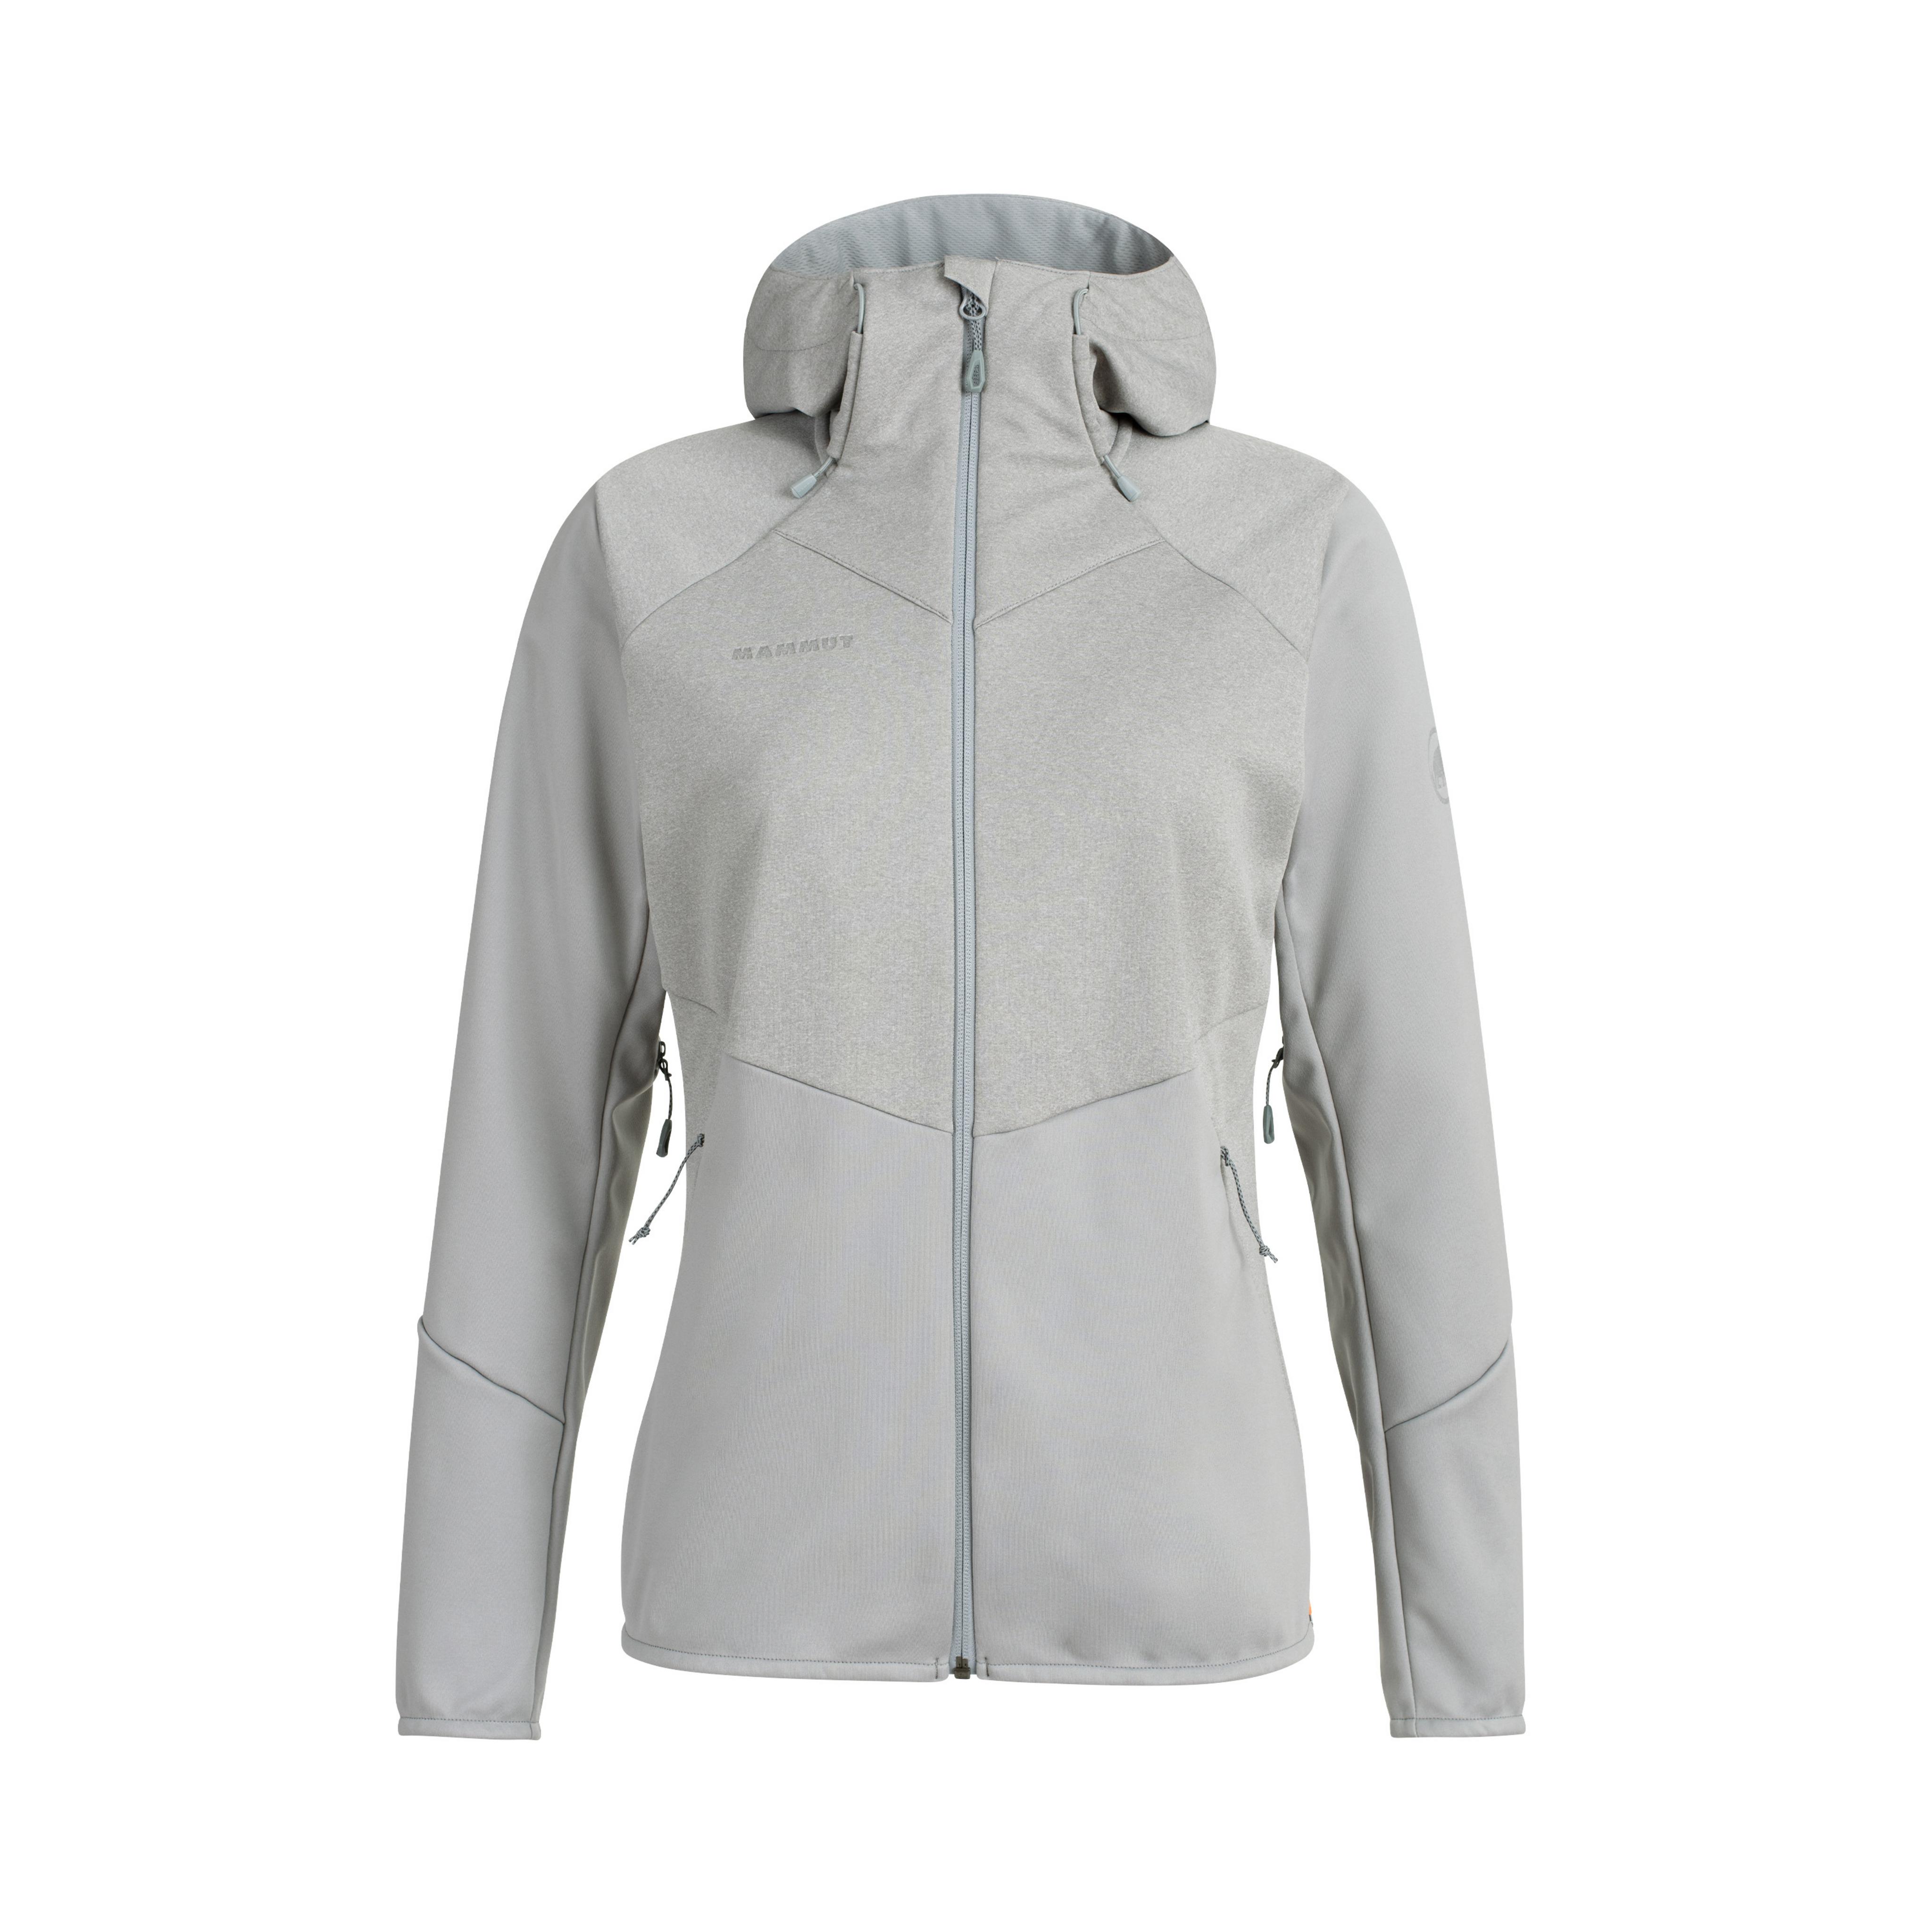 Ultimate VI SO Hooded Jacket Women - granit-granit melange, XL thumbnail